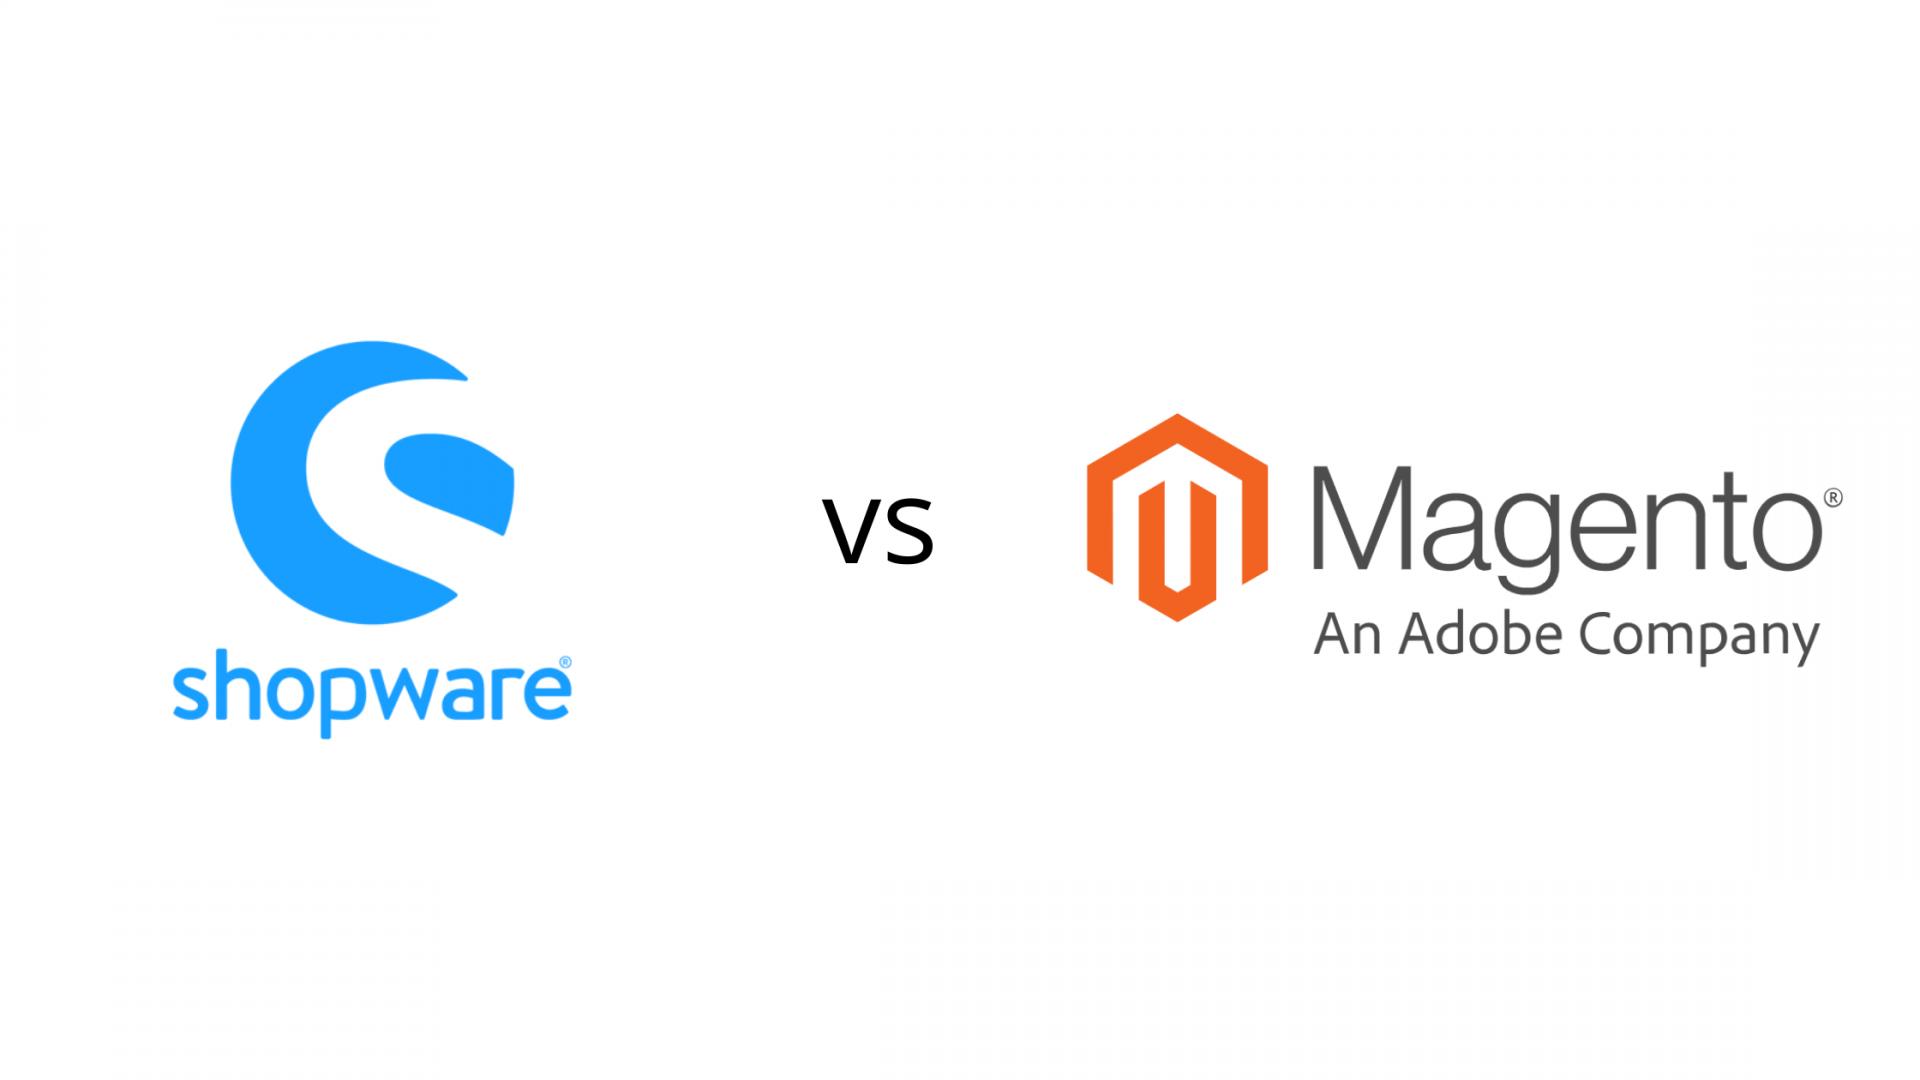 shopware vs magento